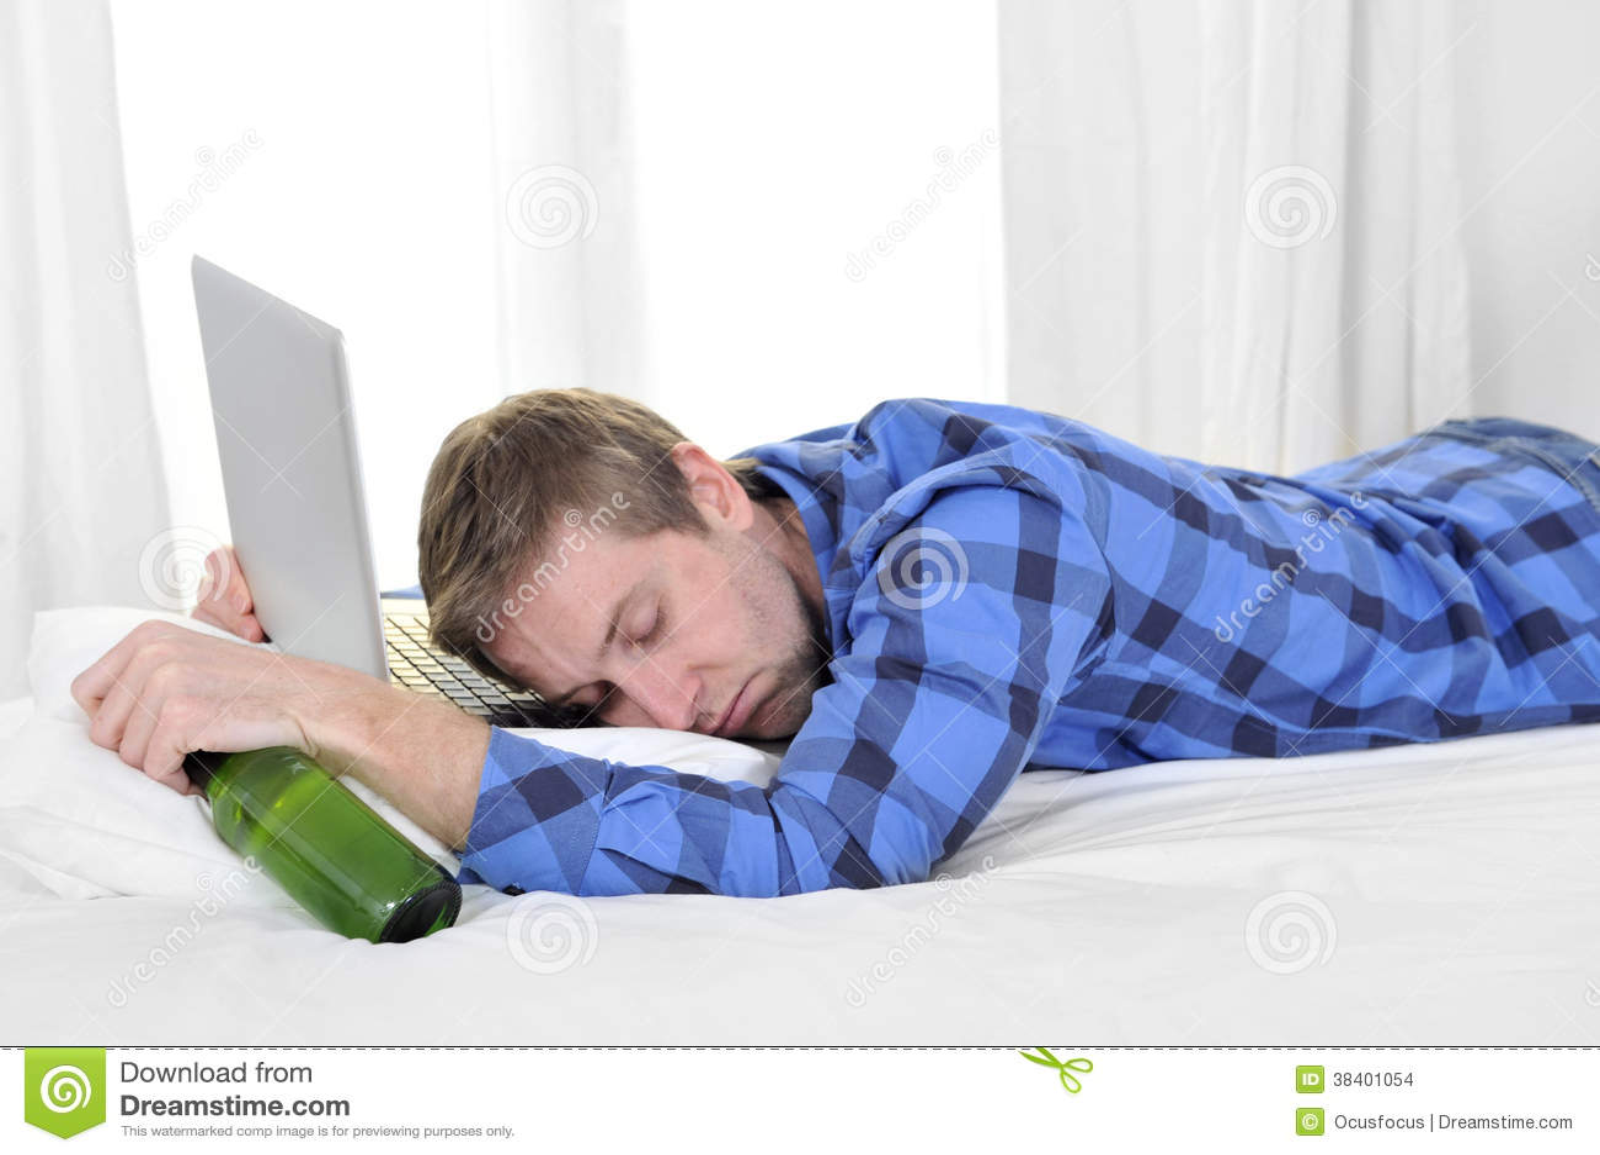 student-overworked-asleep-computer-holding-beer-bottle-38401054.jpg